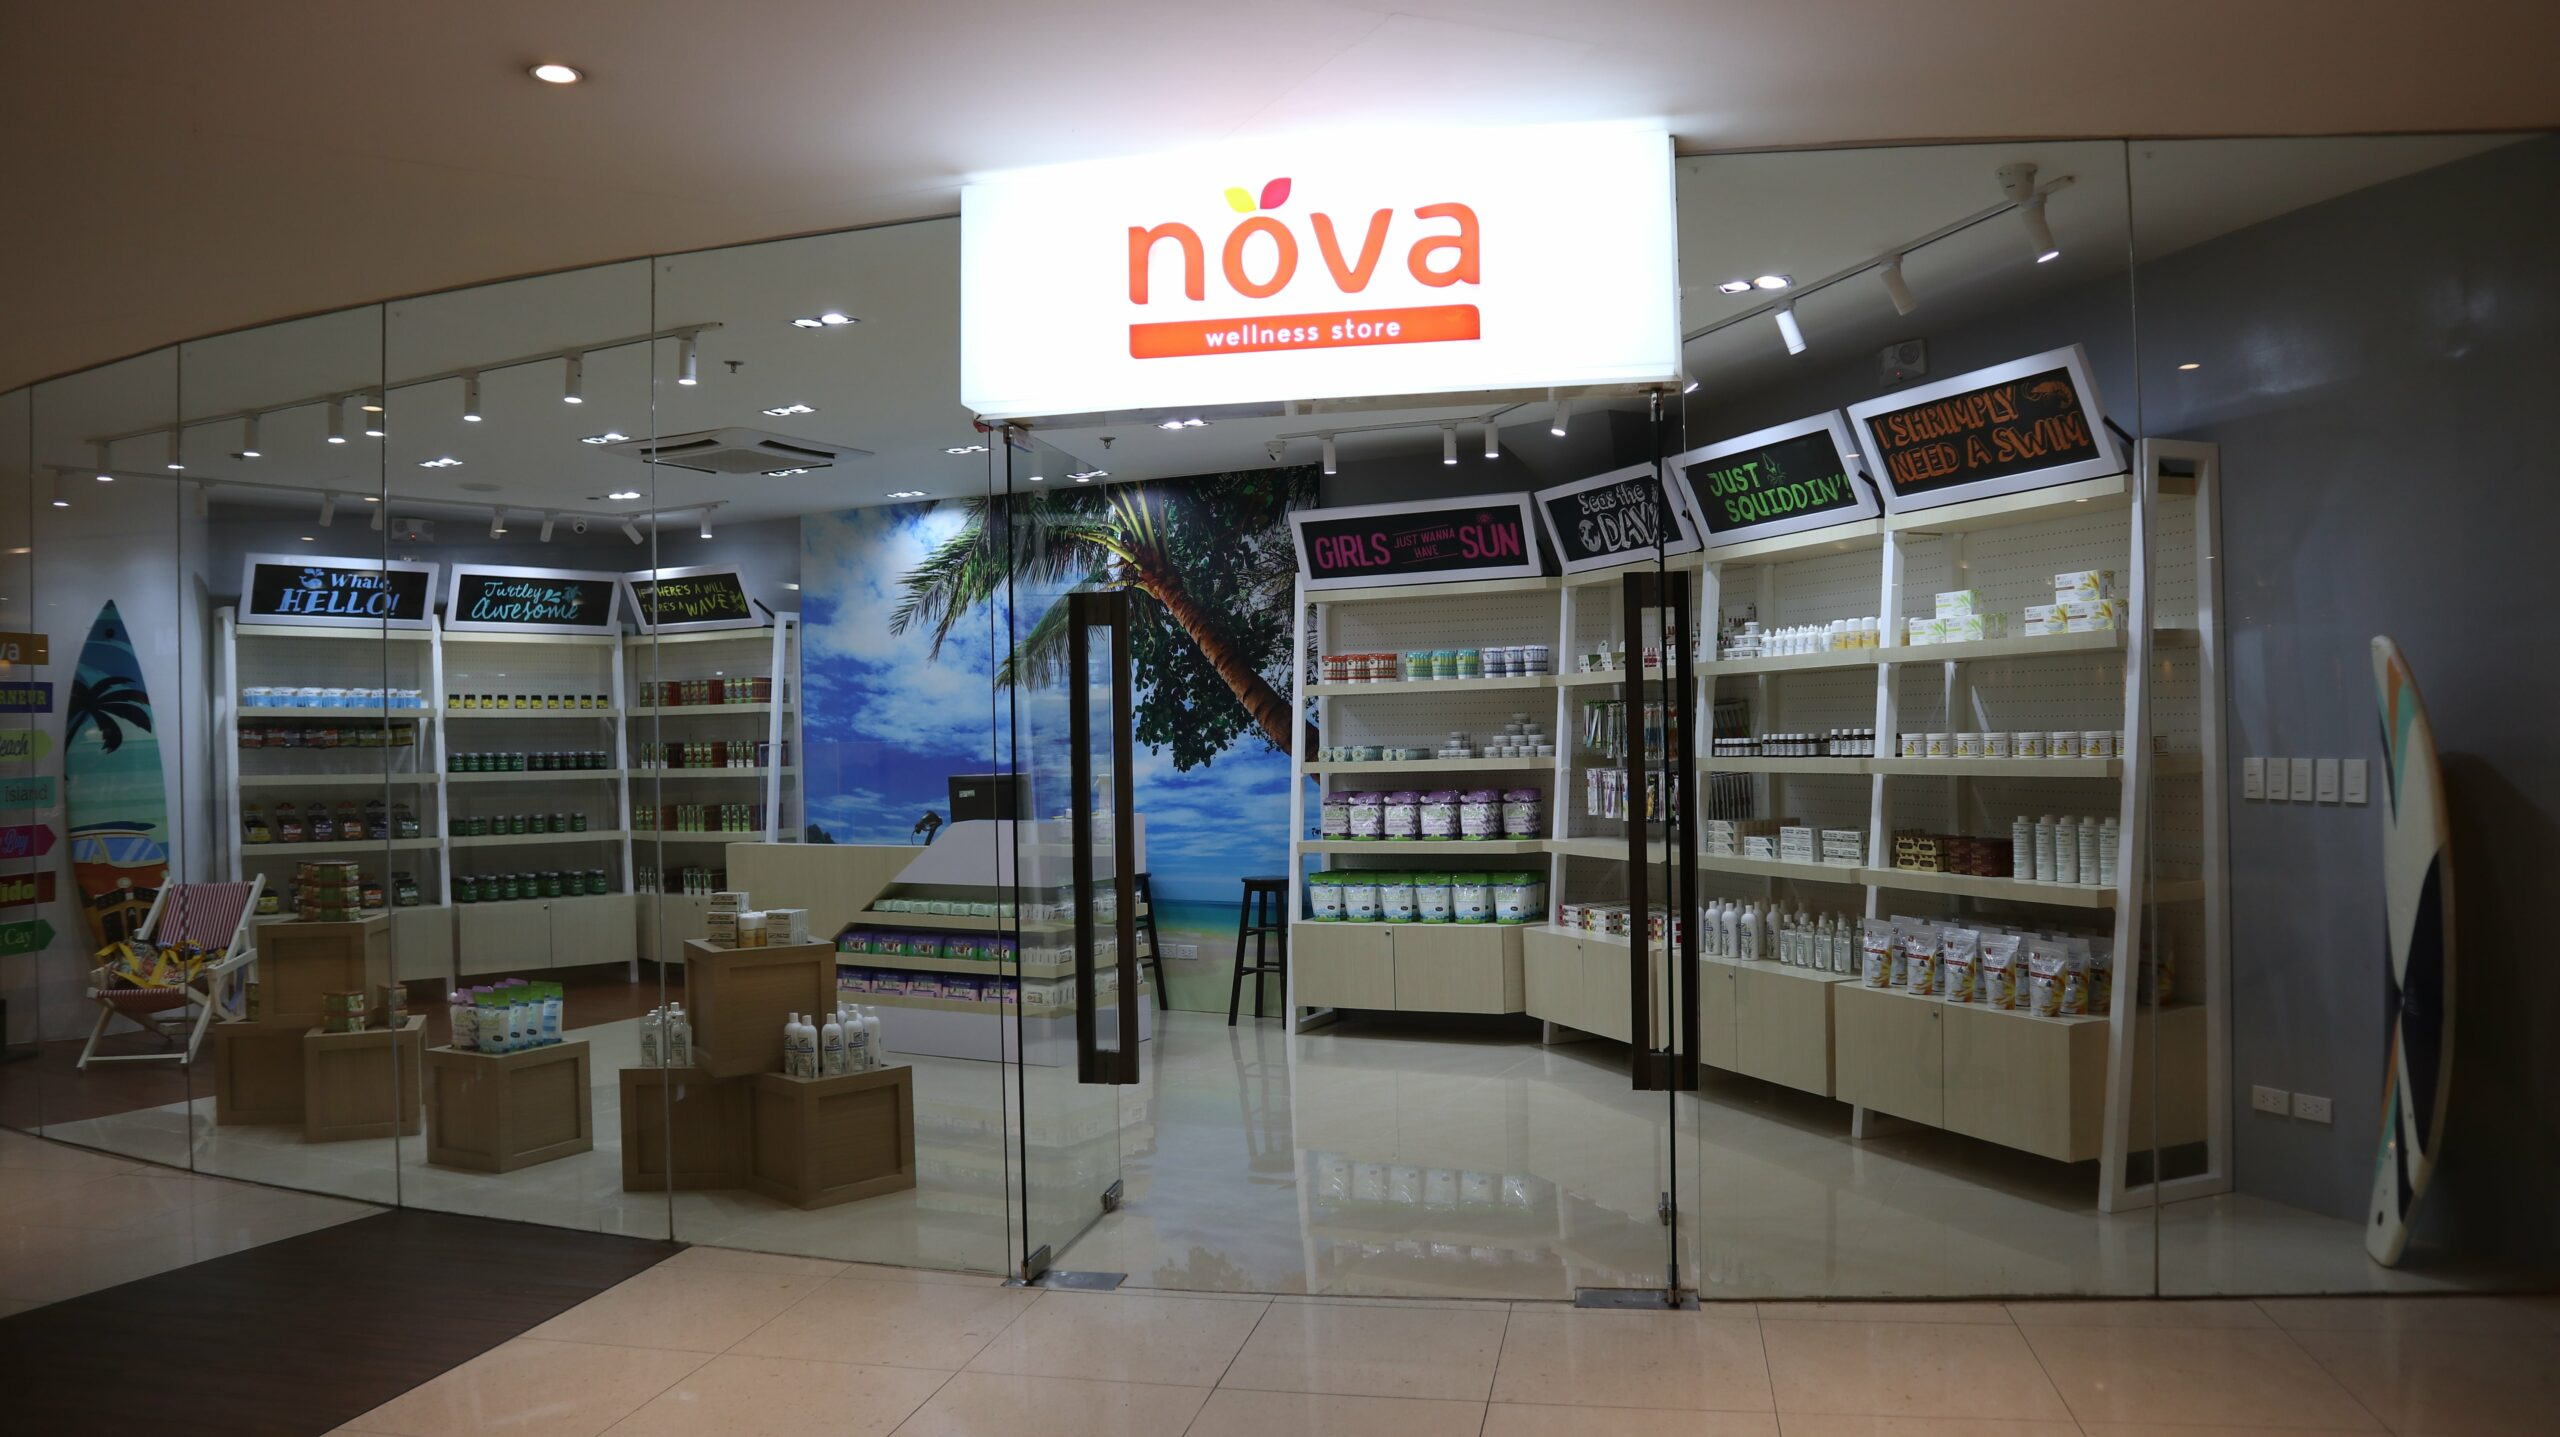 Nova Wellness Store Featured Image